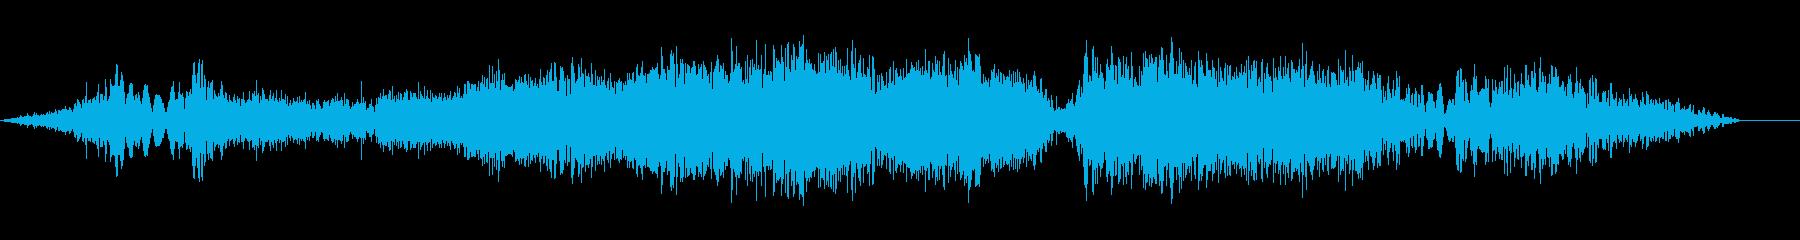 DJ REVERSE INHALE...の再生済みの波形